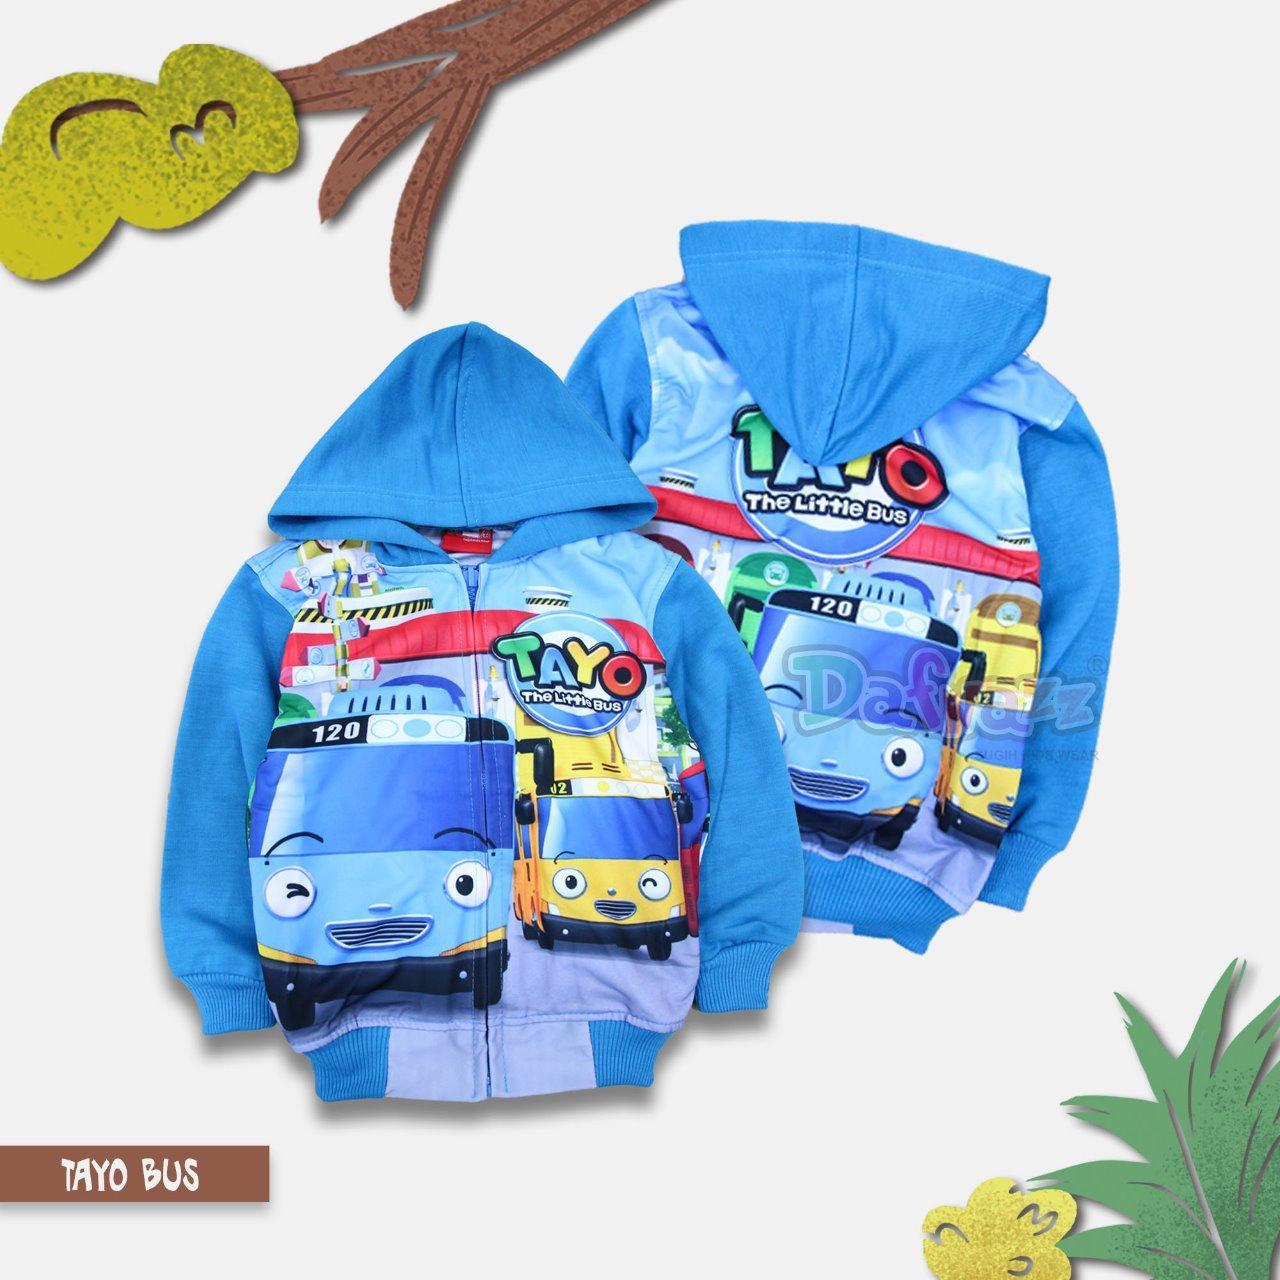 Buy Sell Cheapest Dafnazz Tayo Cute Best Quality Product Deals Katalog Anak Lelaki Jaket Laki Printing Biru